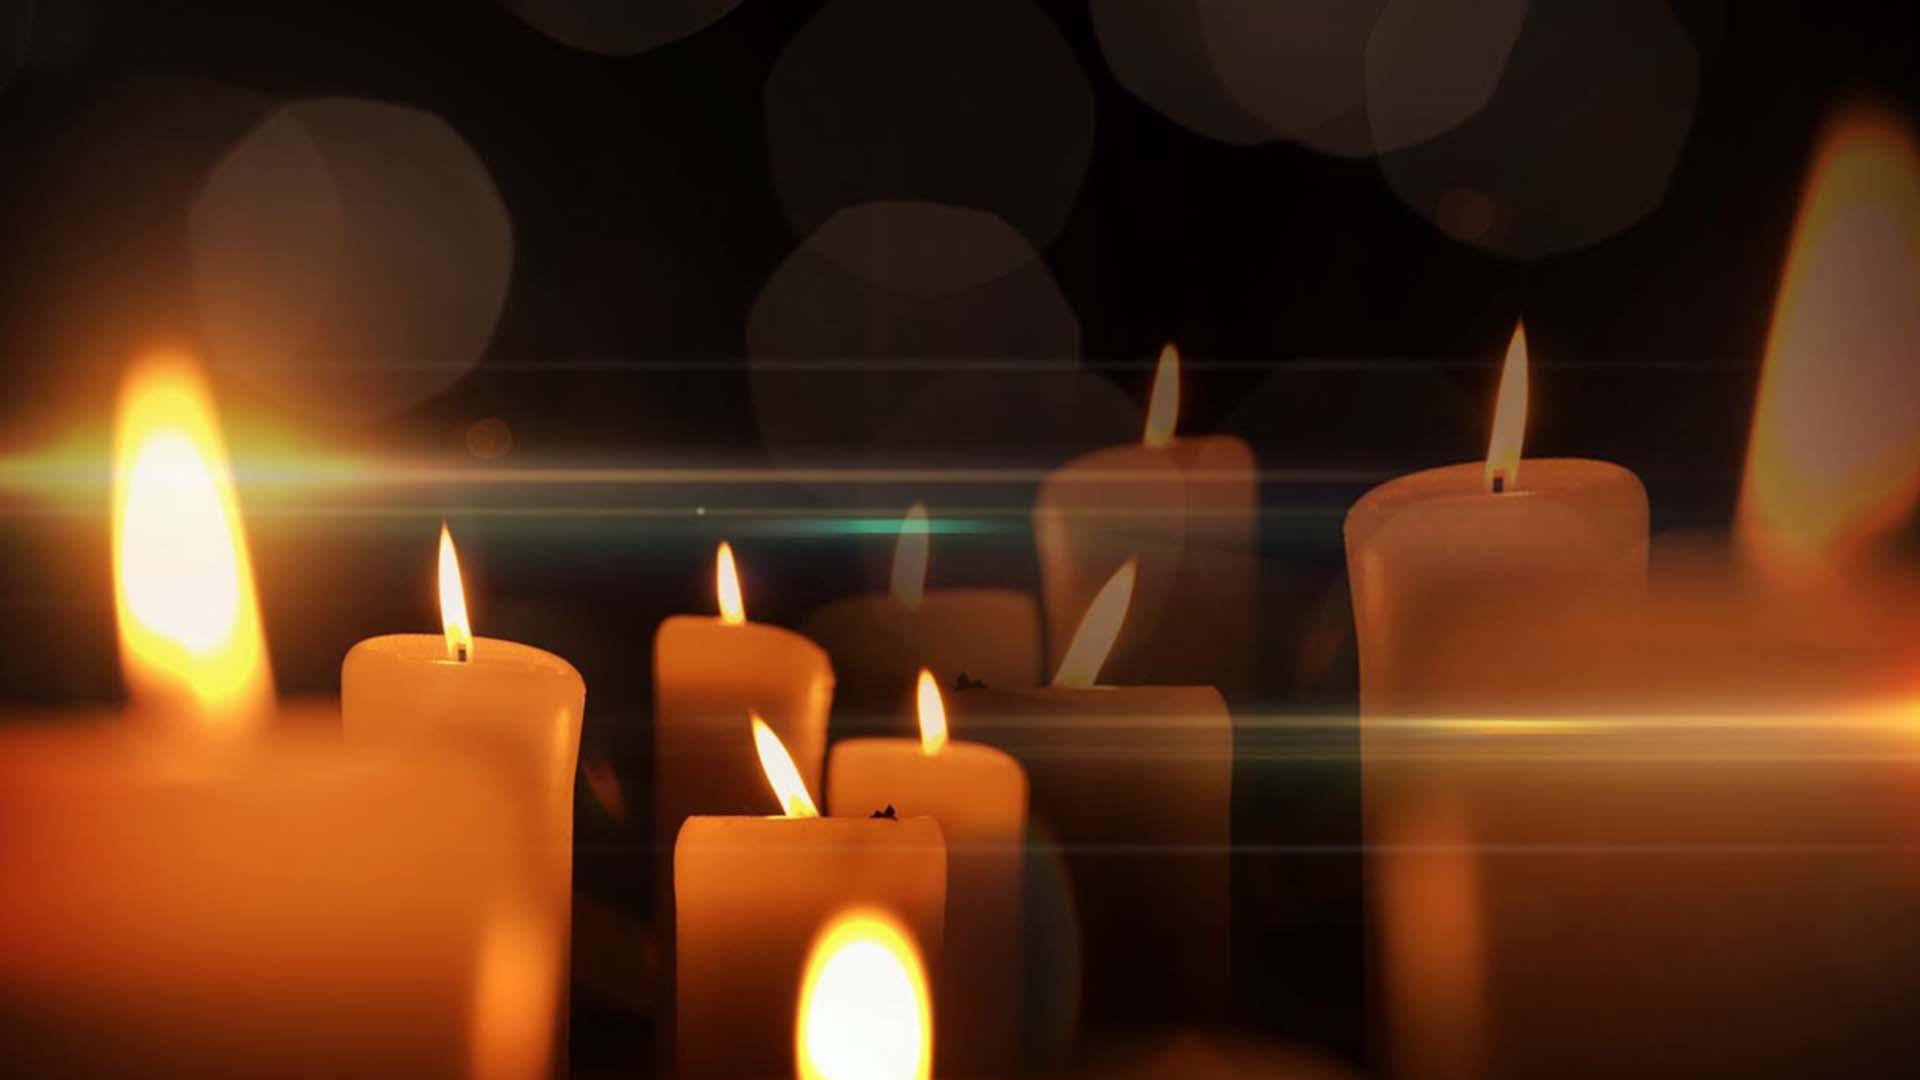 candles_1556830370639.jpg